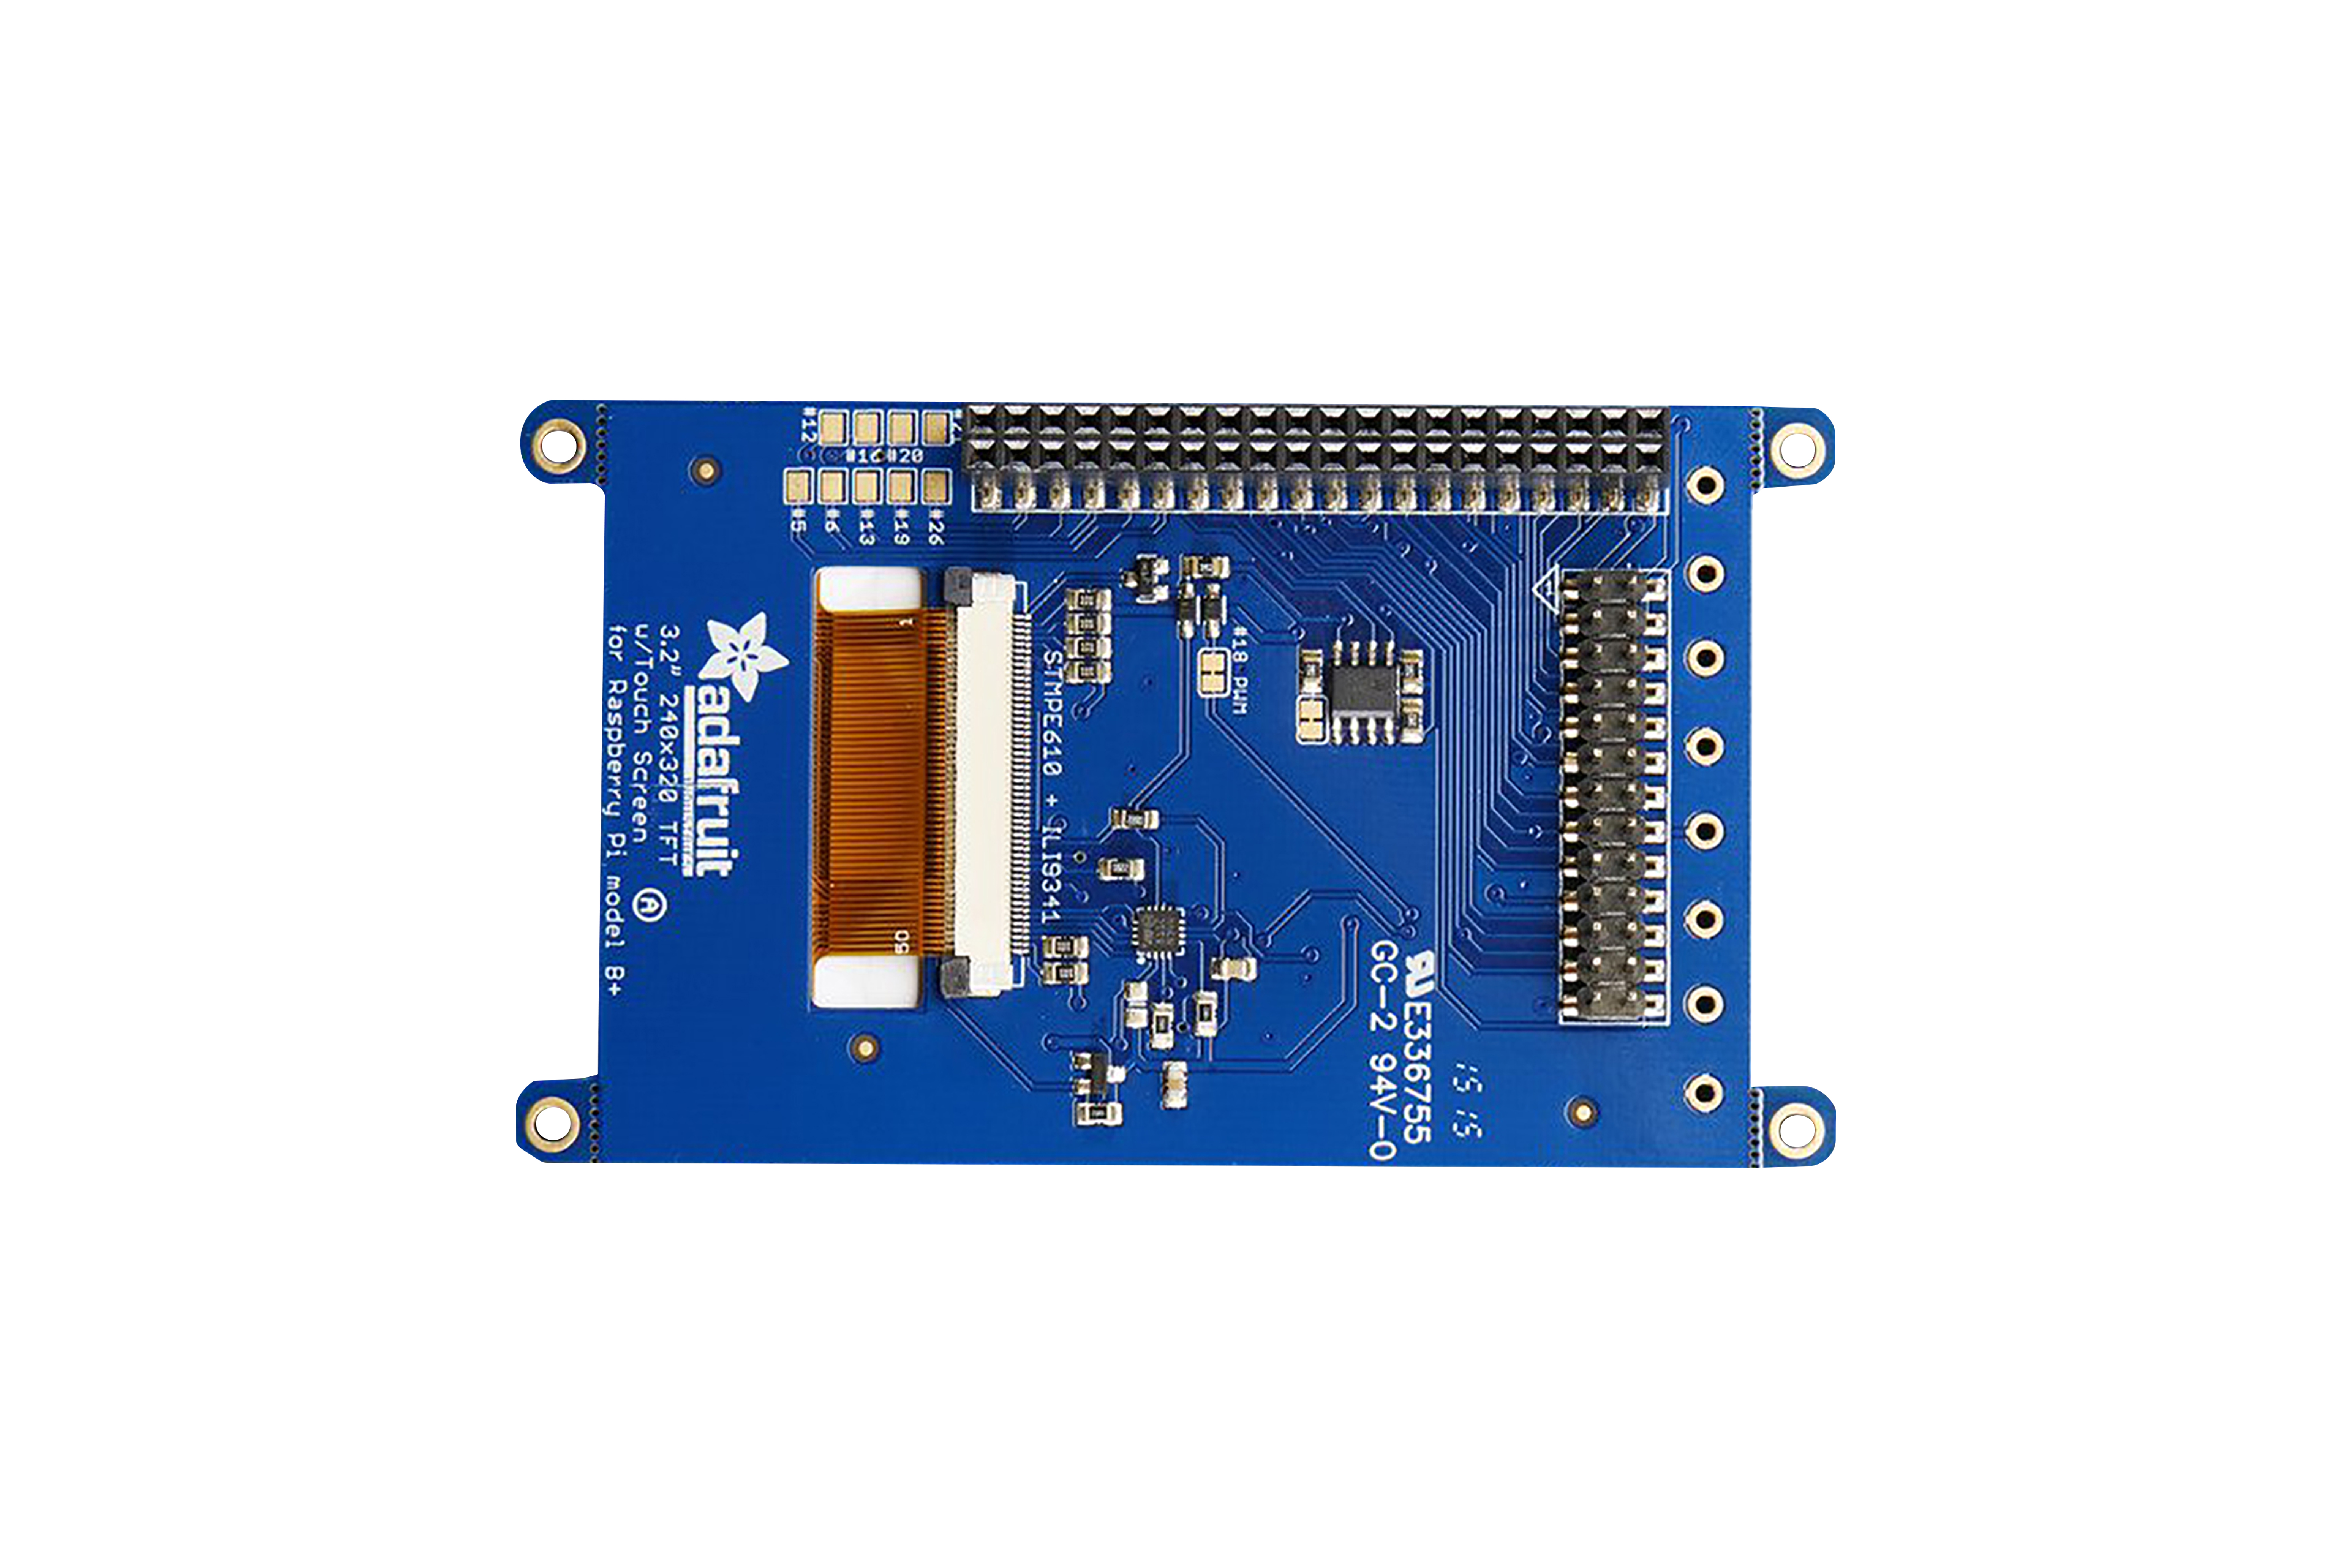 PiTFT Plus 3,2-Zoll-LCD-Touchscreen für Pi